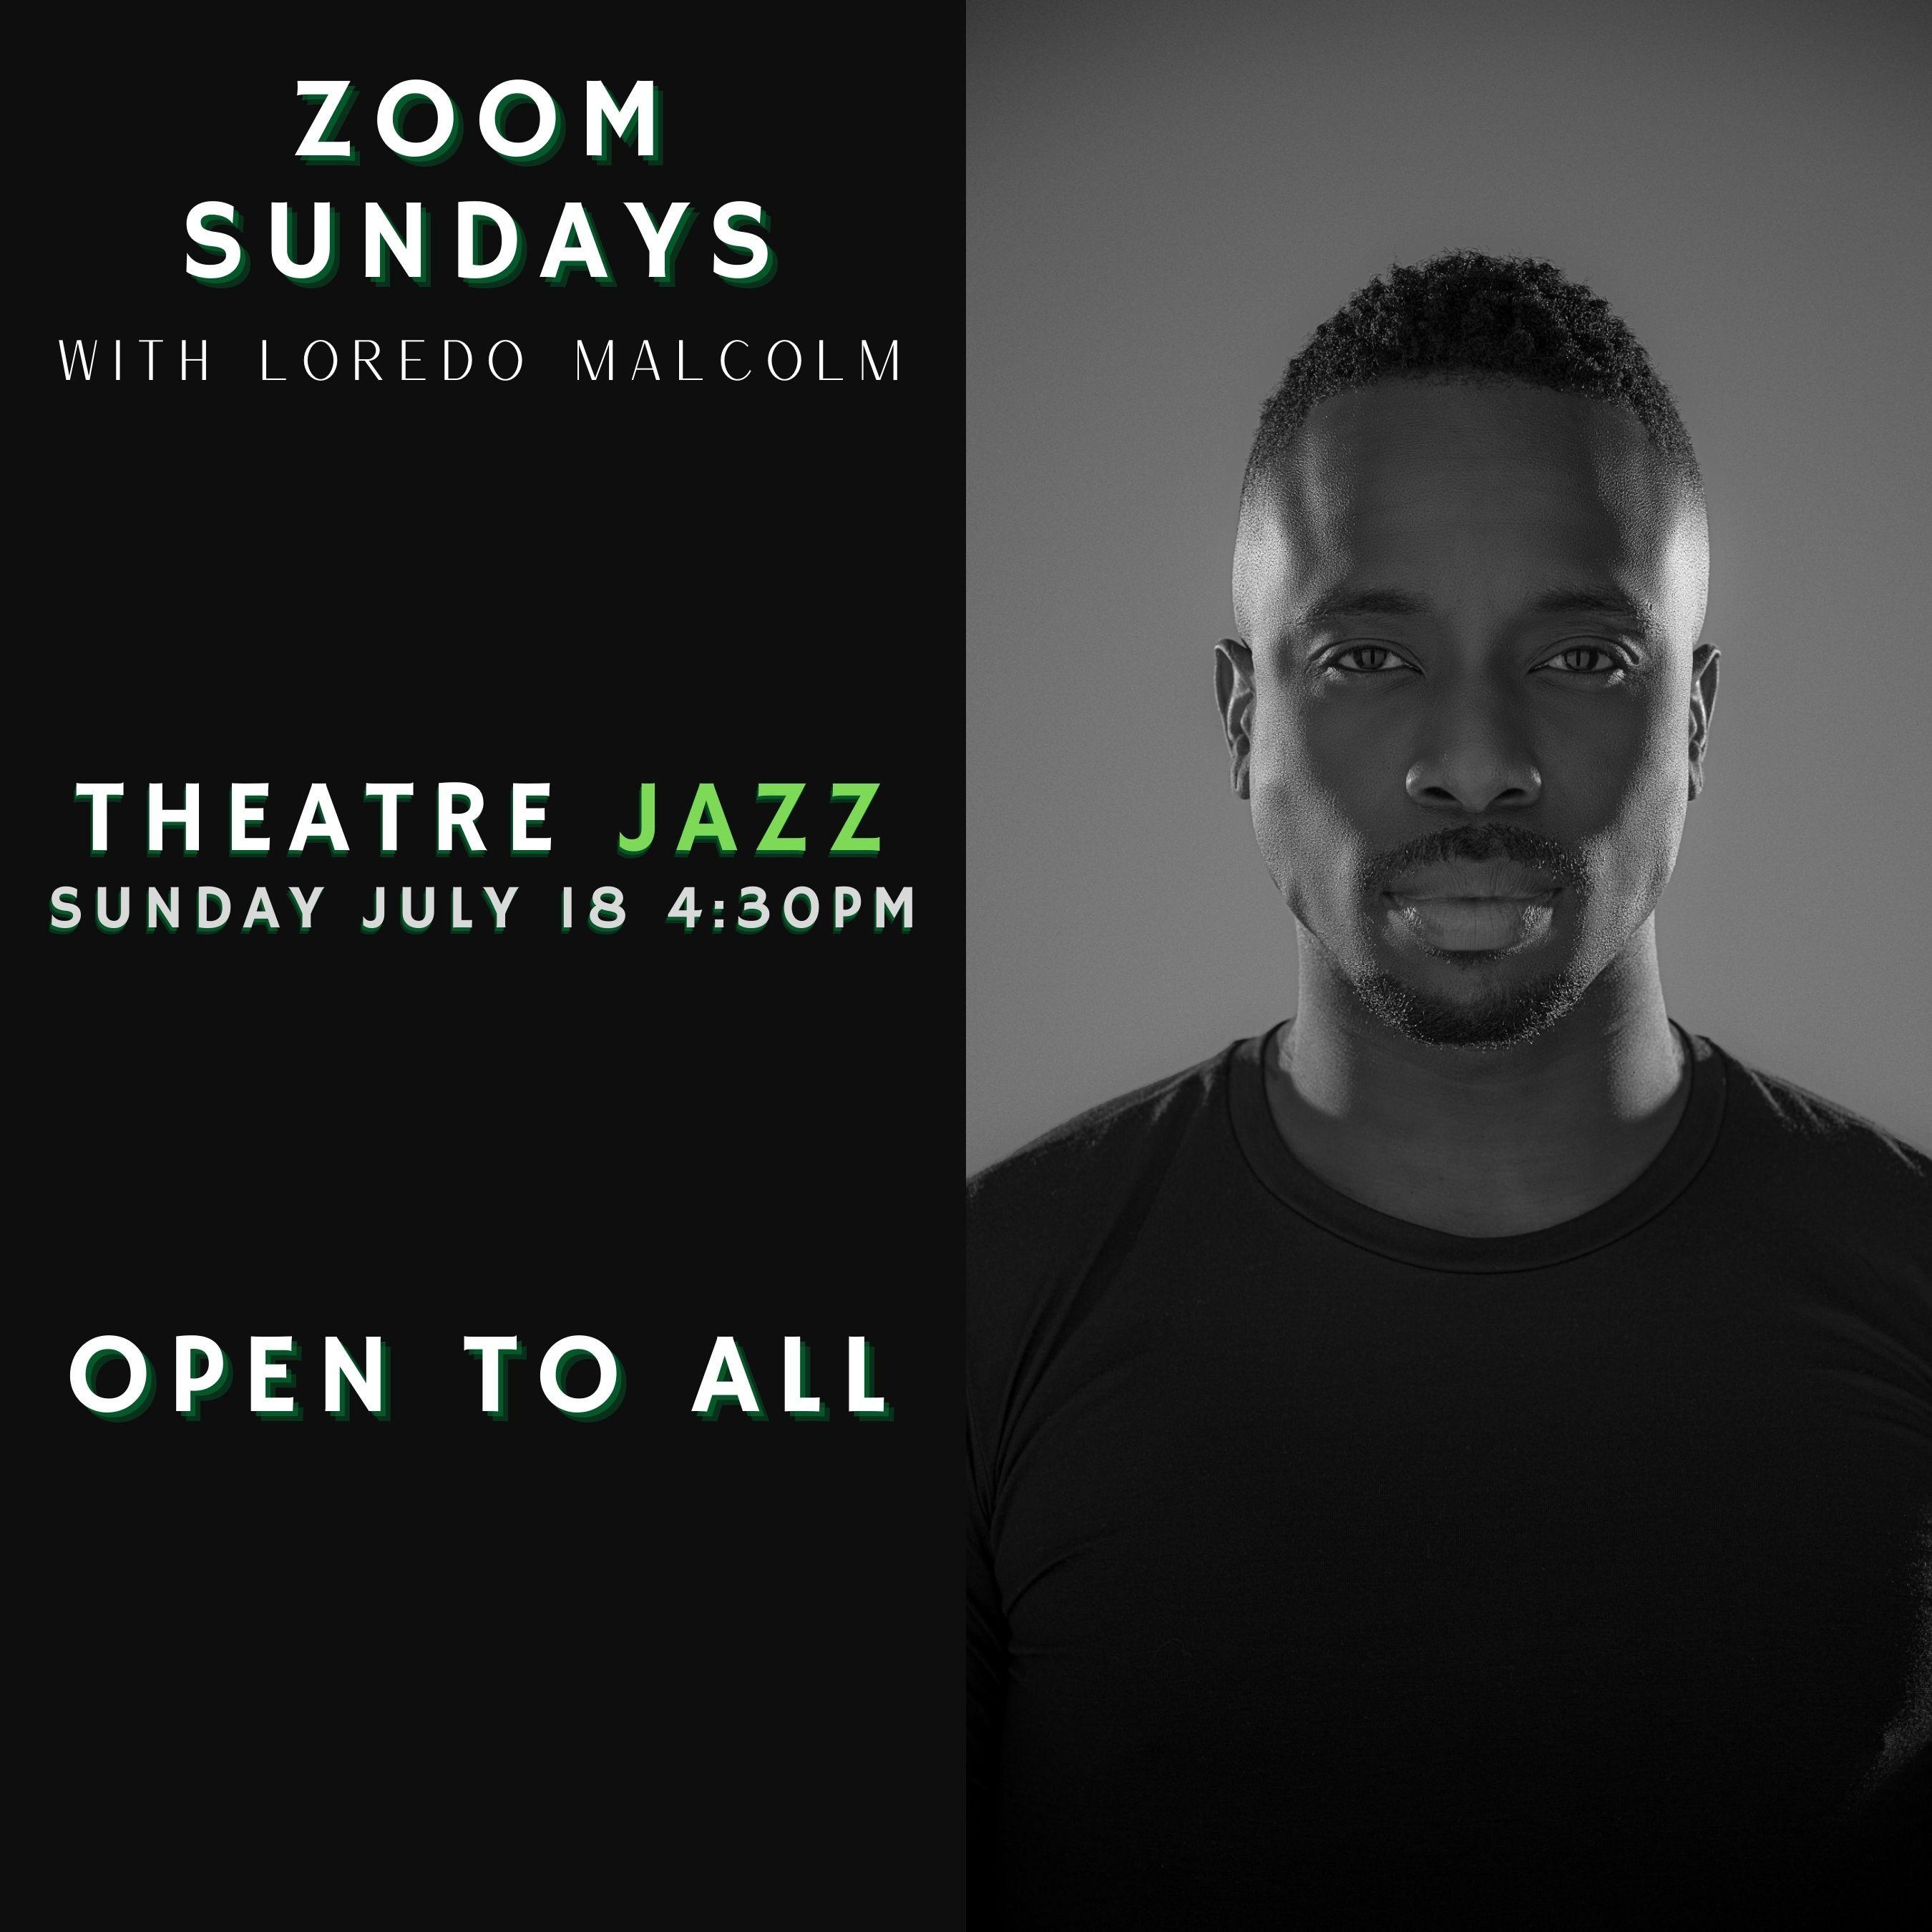 Zoom Sun Theatre Jazz July 18th 4:30PM